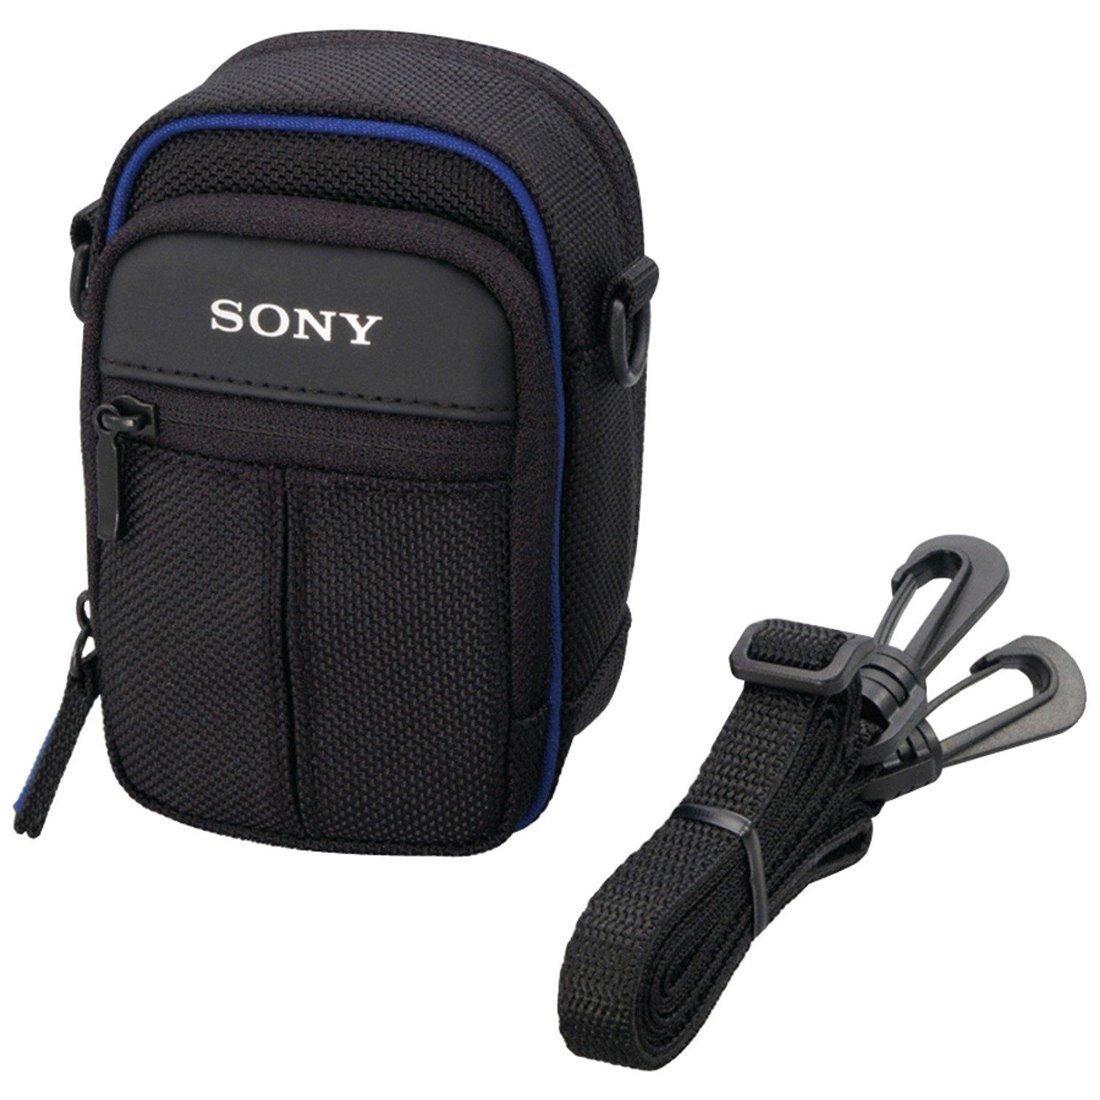 Sony Housse de transport LCSCSJ.AE